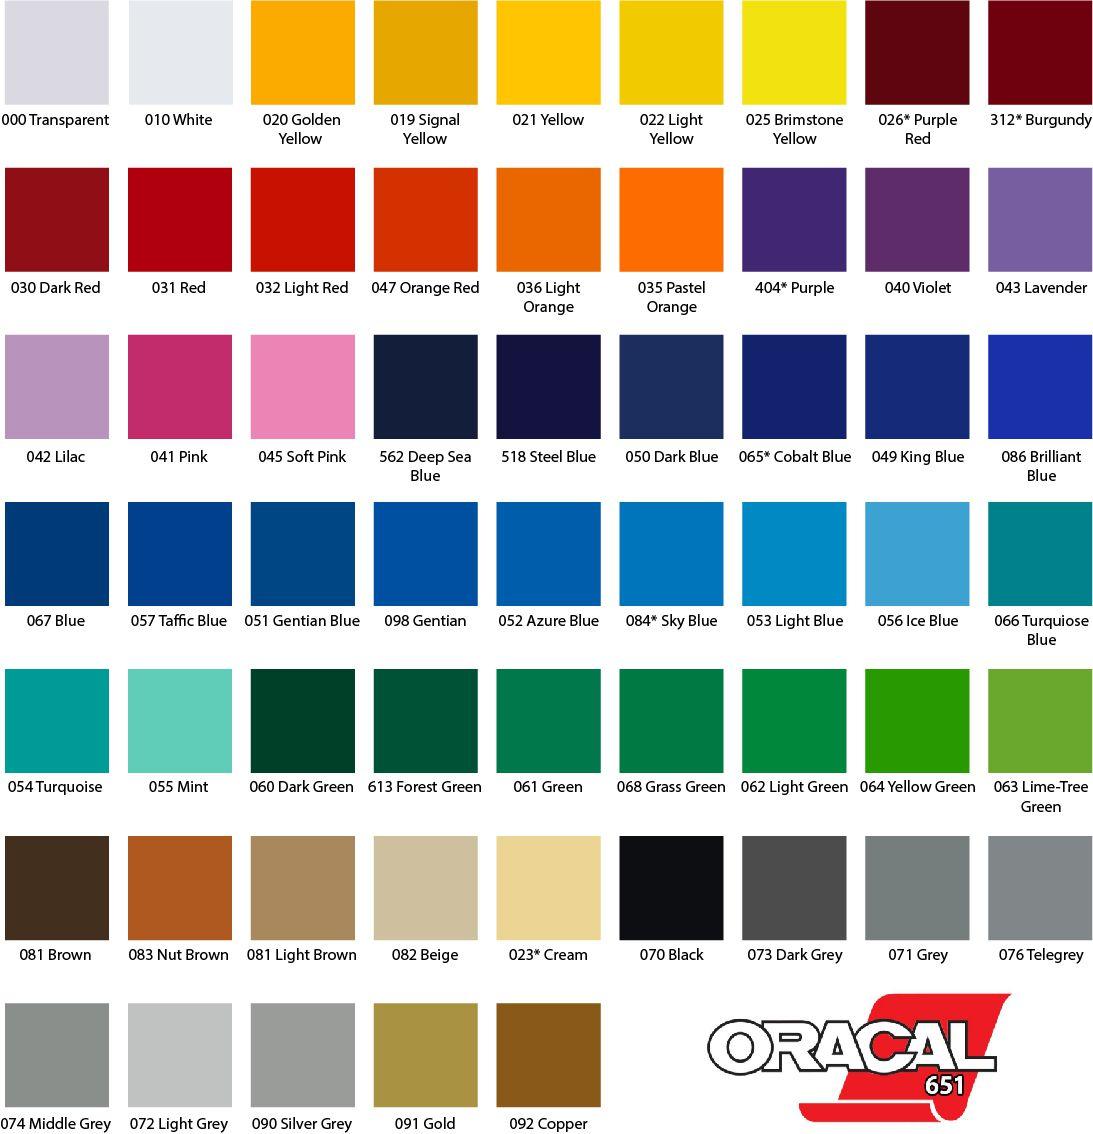 Adesivo Oracal 651 030 Dark Red 0,63m x 1,00m